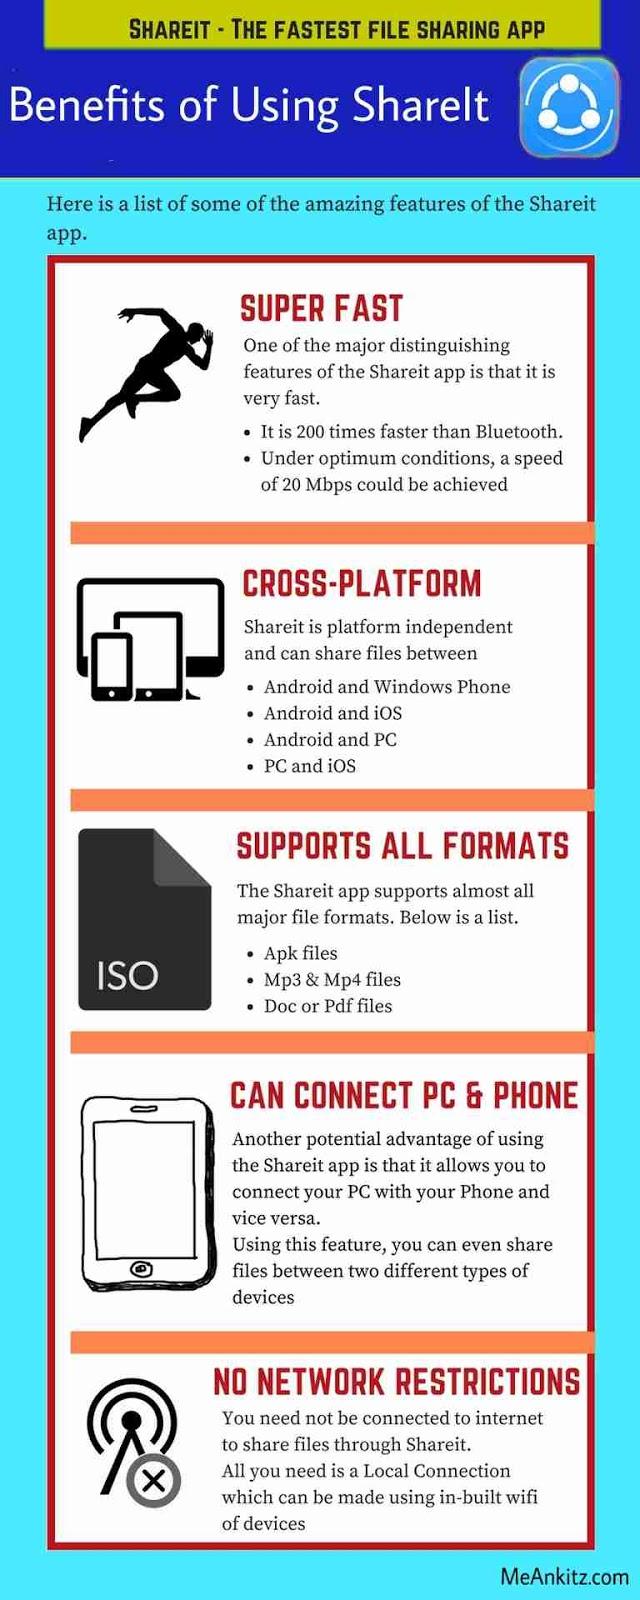 Benefits of using shareit